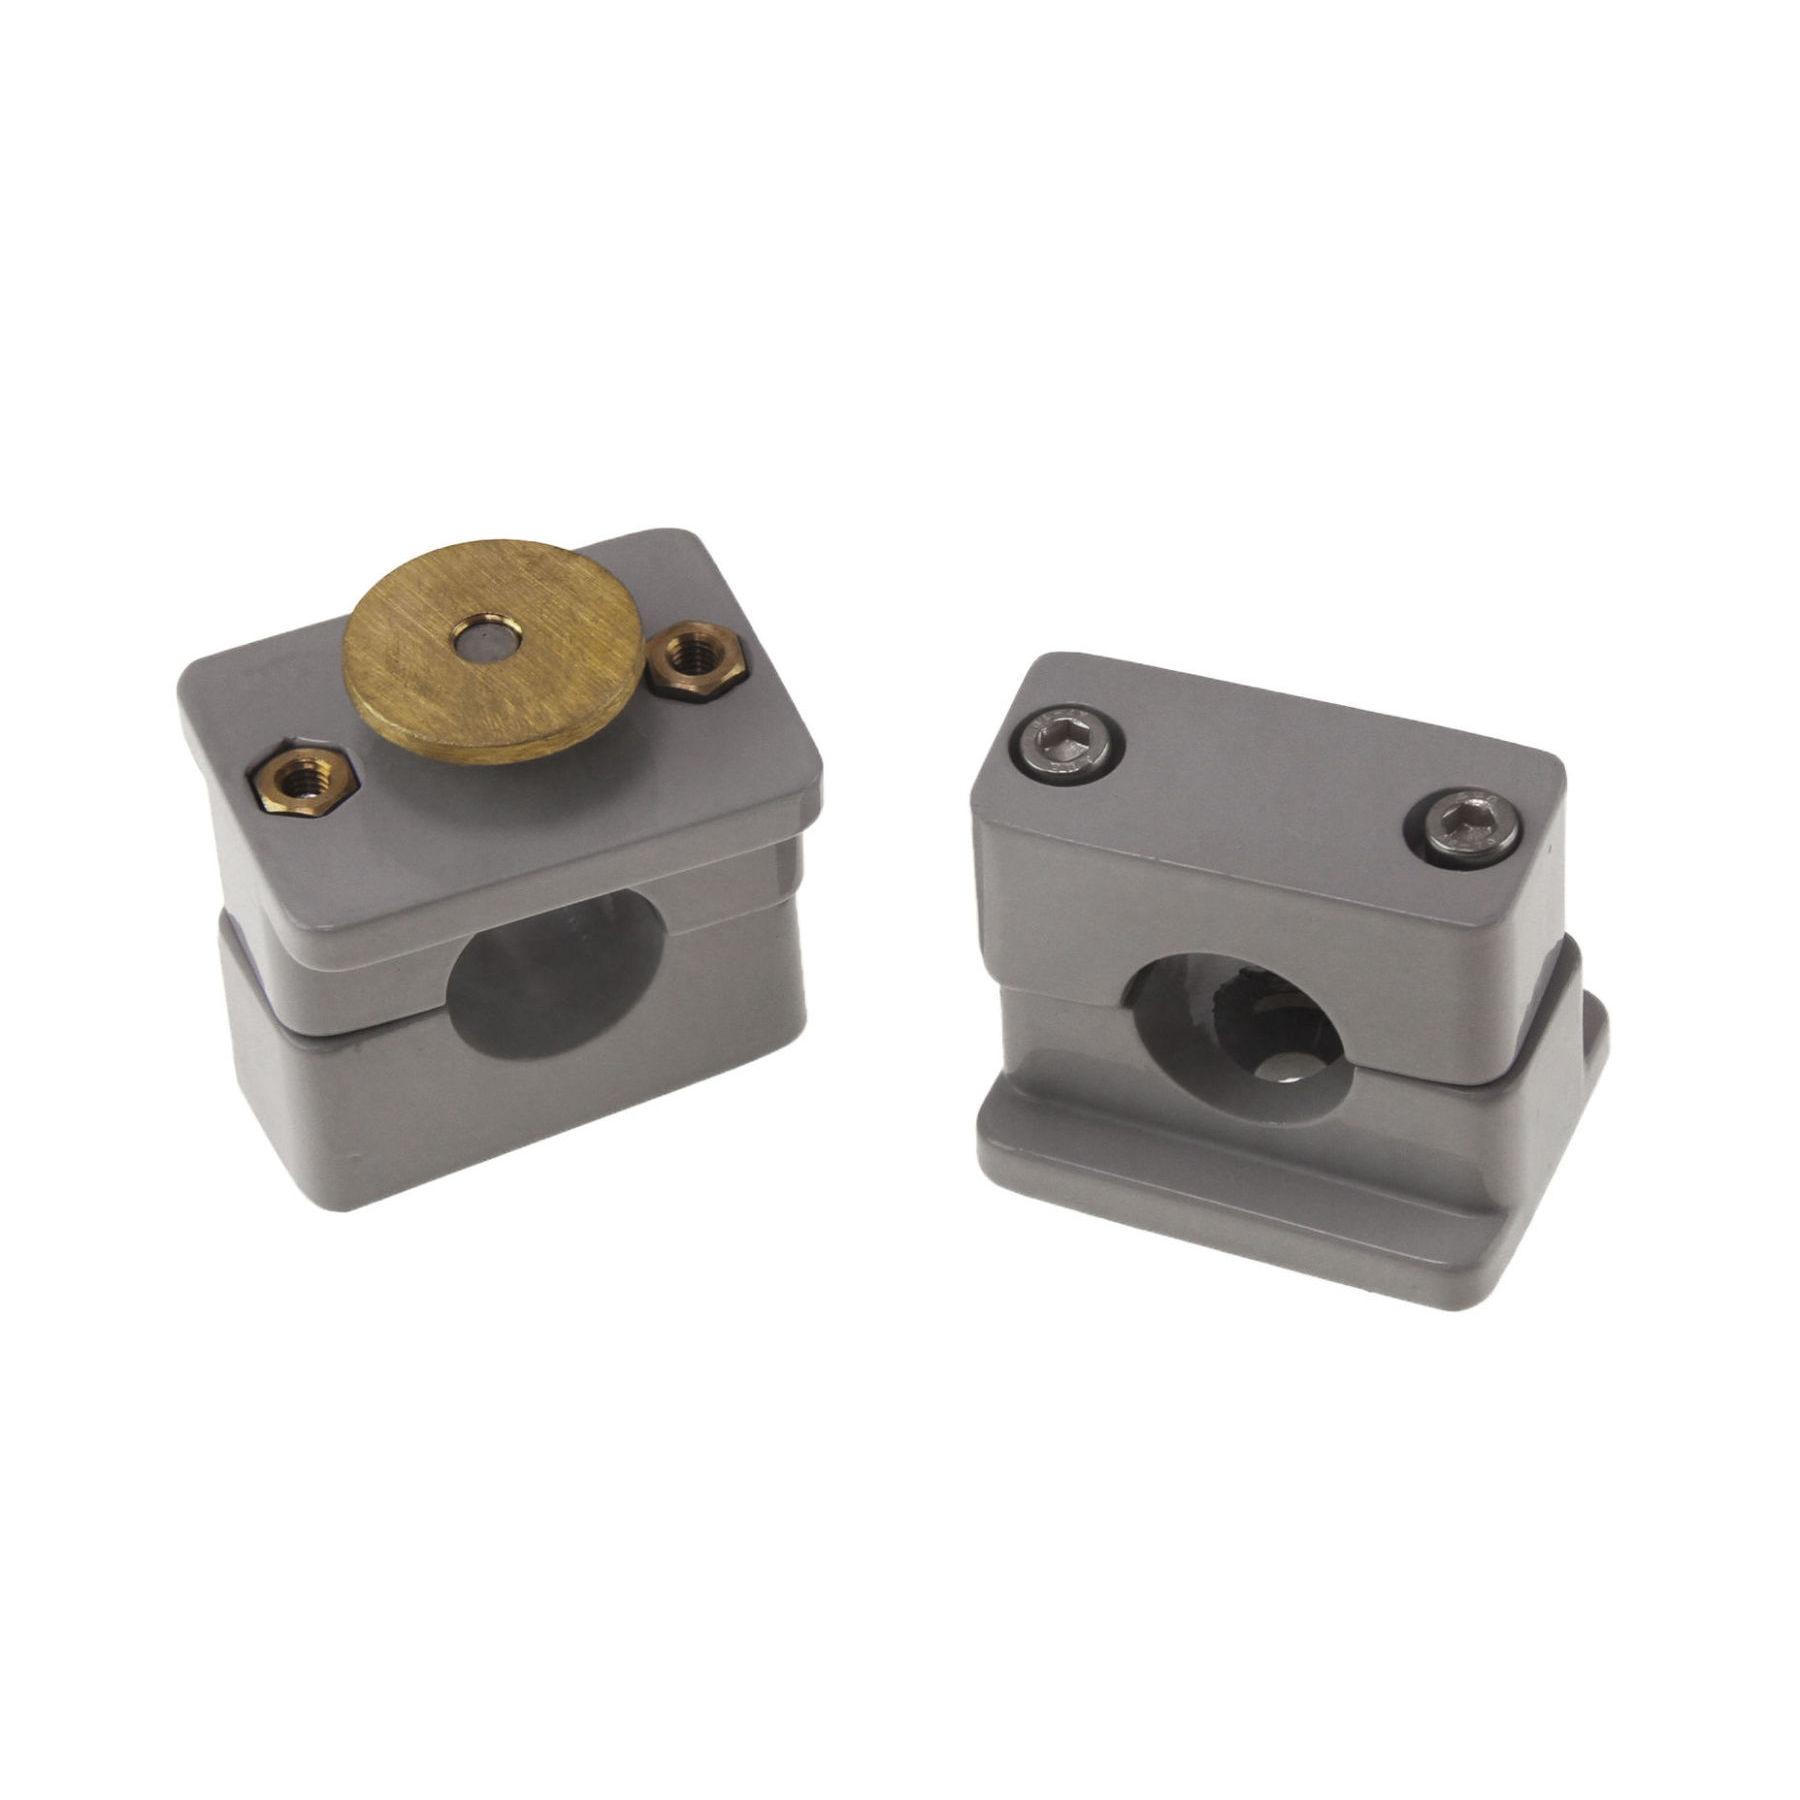 T-nut Clamp, 124301T Kit